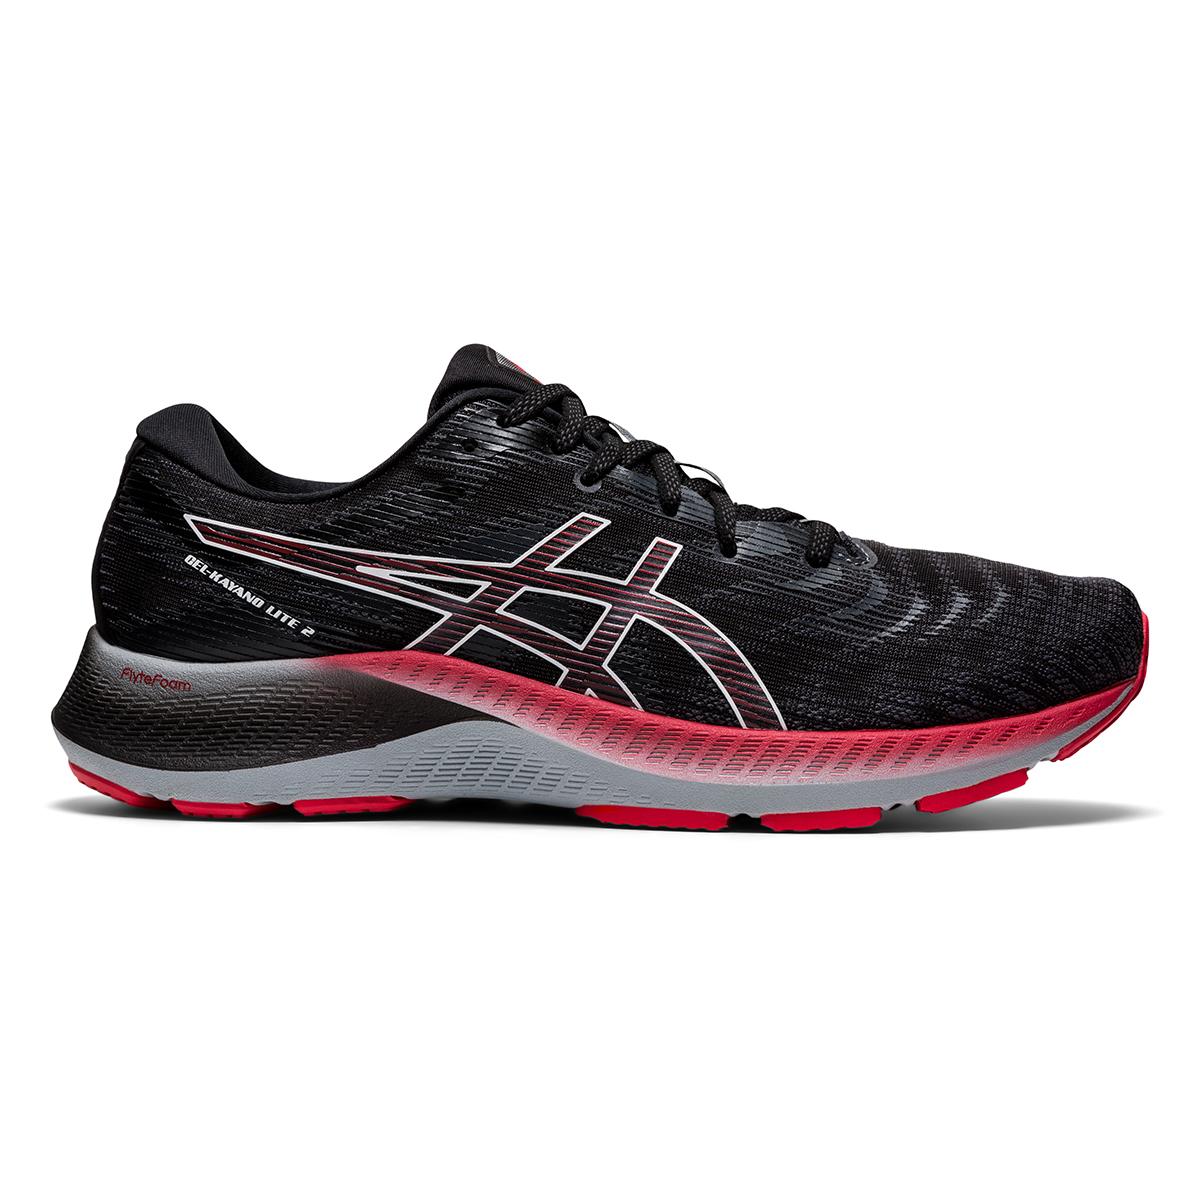 Men's Asics Gel-Kayano Lite 2 Running Shoe - Color: Black/White - Size: 7 - Width: Regular, Black/White, large, image 1